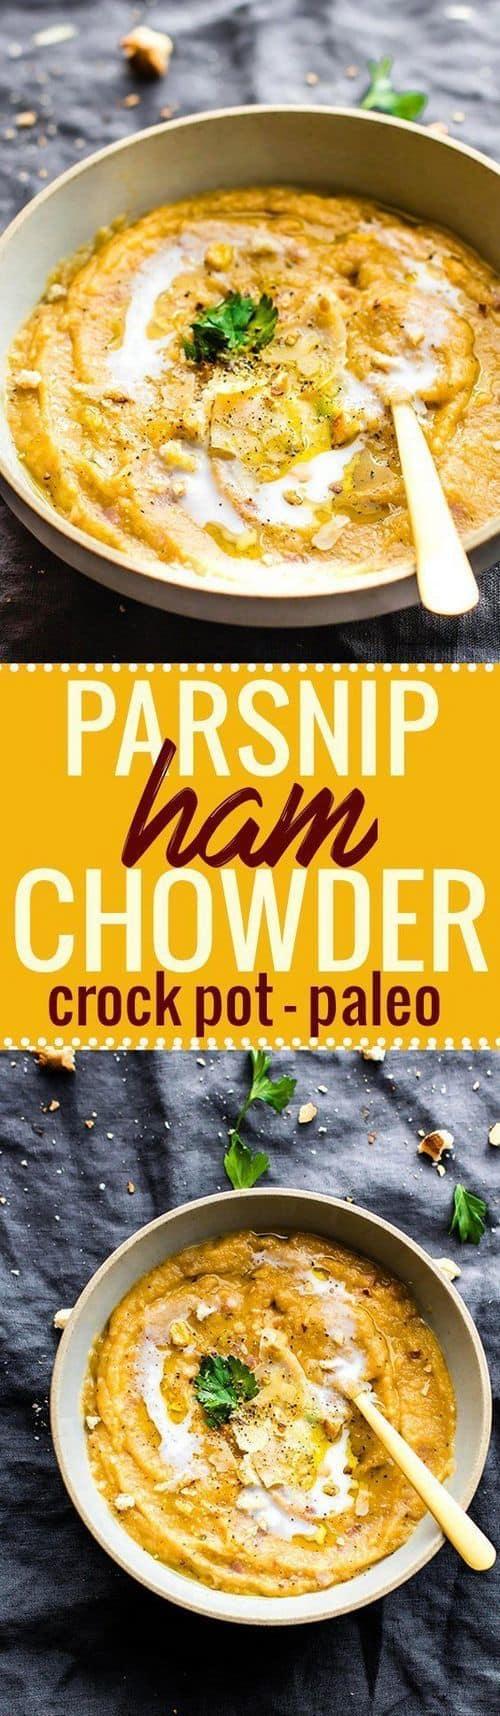 crock-pot-parsnip-ham-chowder-paleo